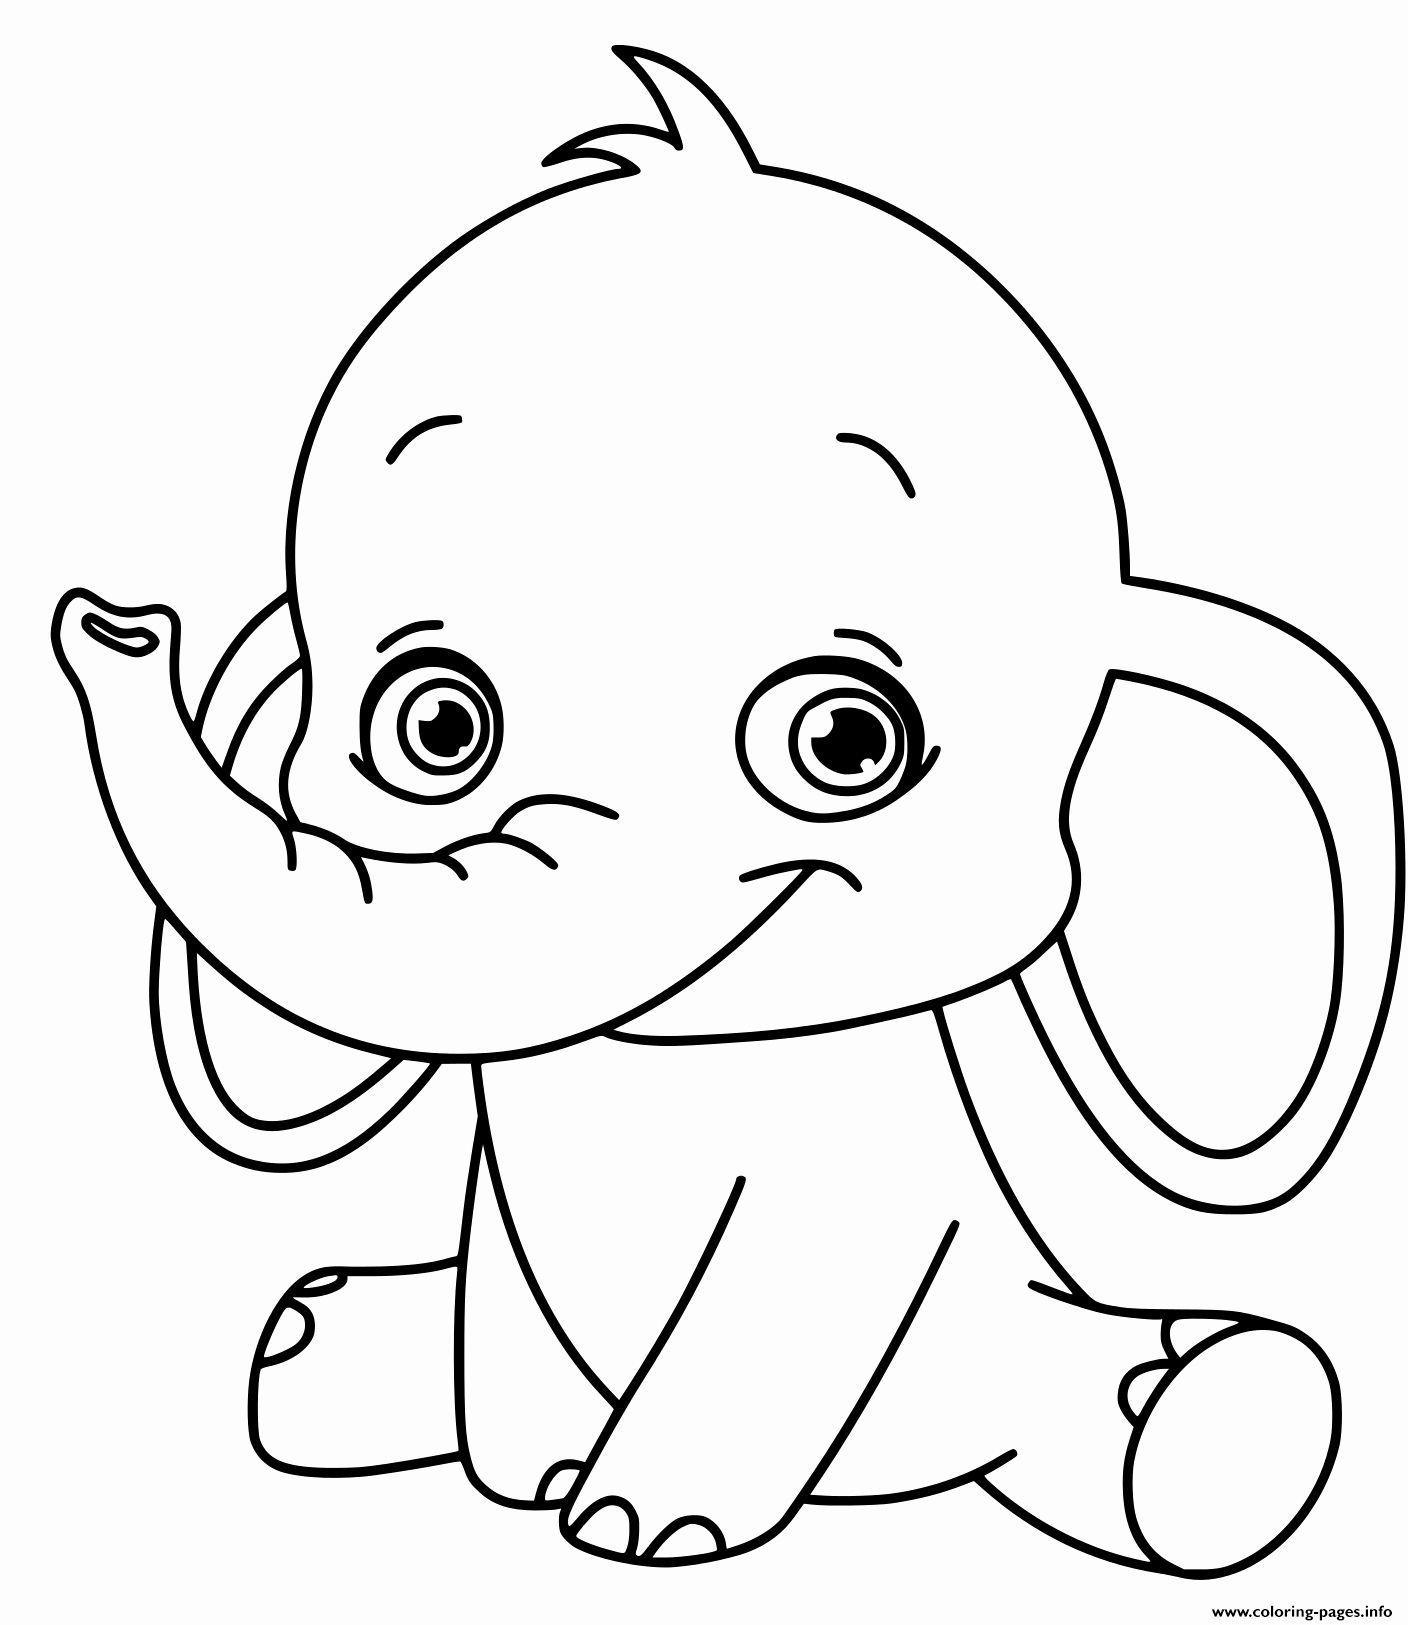 Coloring Pages Disney Free Printable Elephant - PeepsBurgh